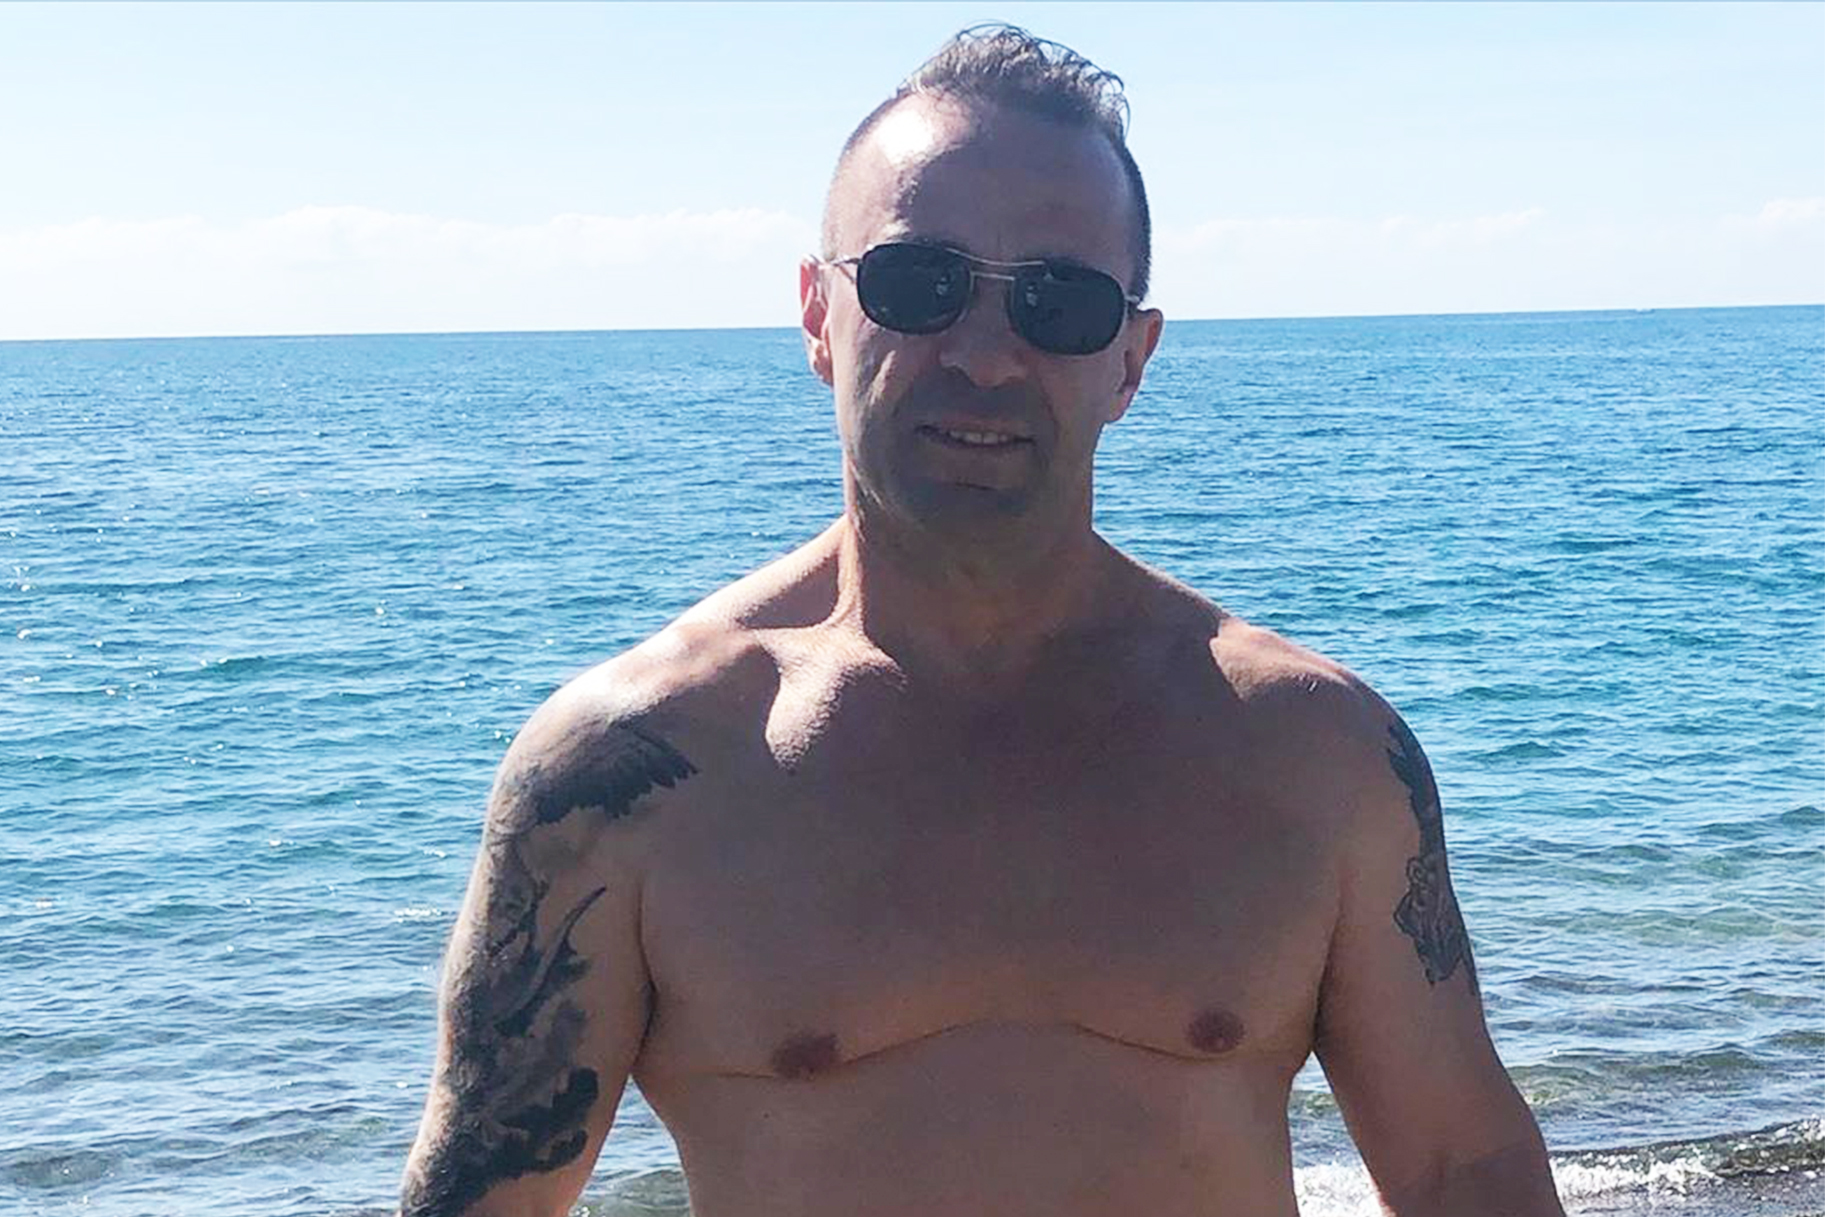 Joe Giudice Splits Pants After Long Workout in Italy ...